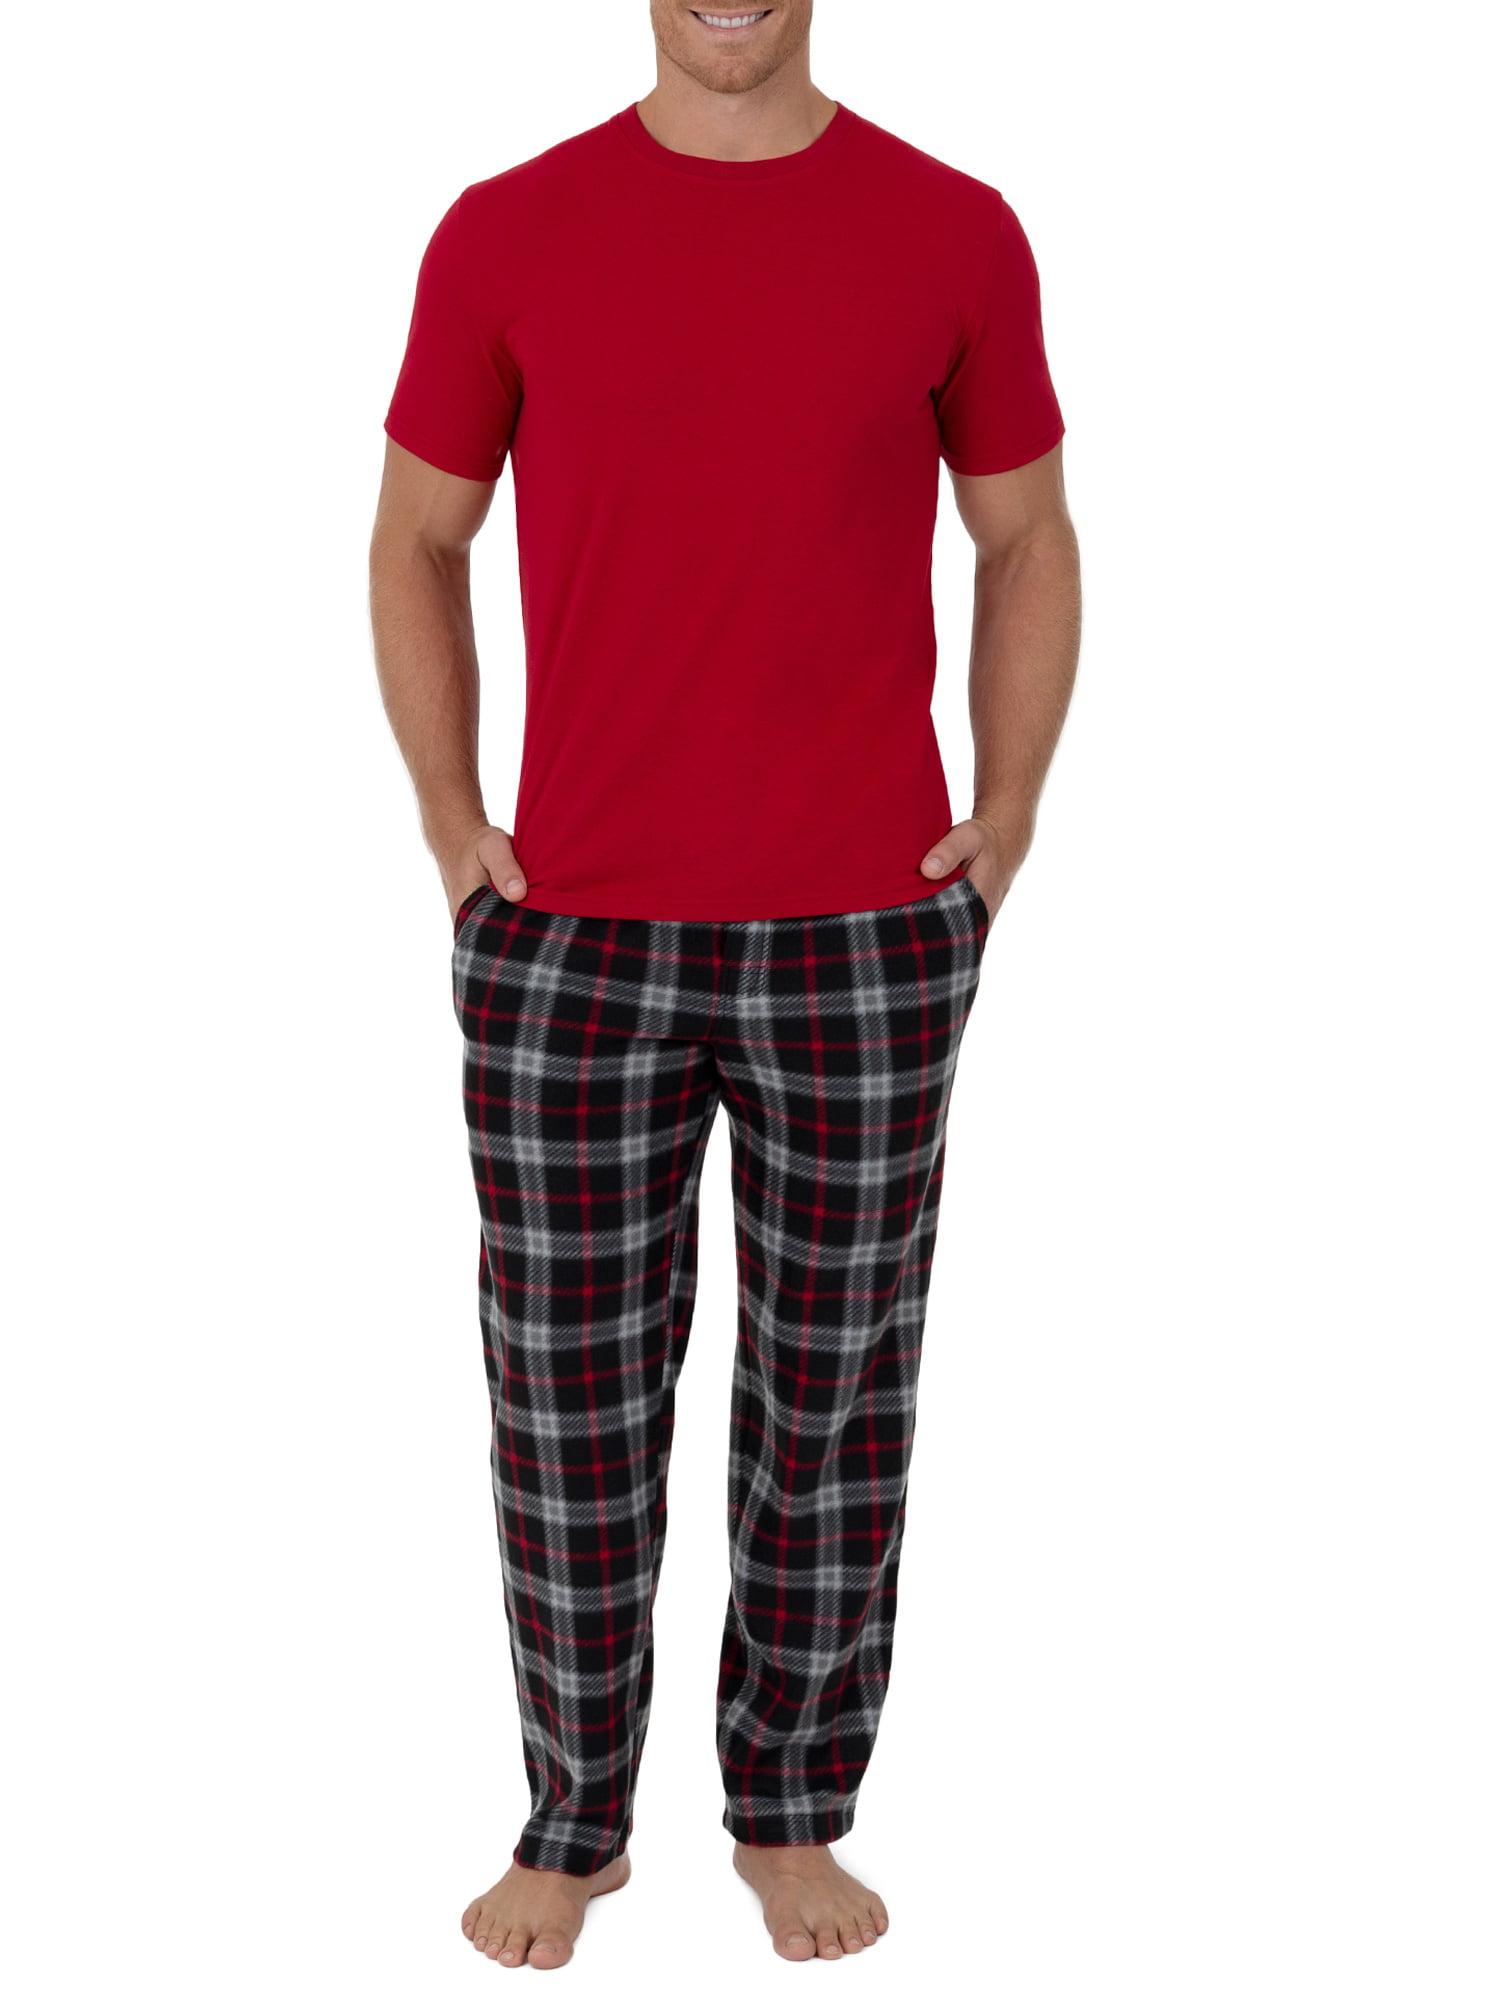 Fruit of the Loom Men/'s Fleece Sleep Pant and Knit Top Sleep Set Red or Blue